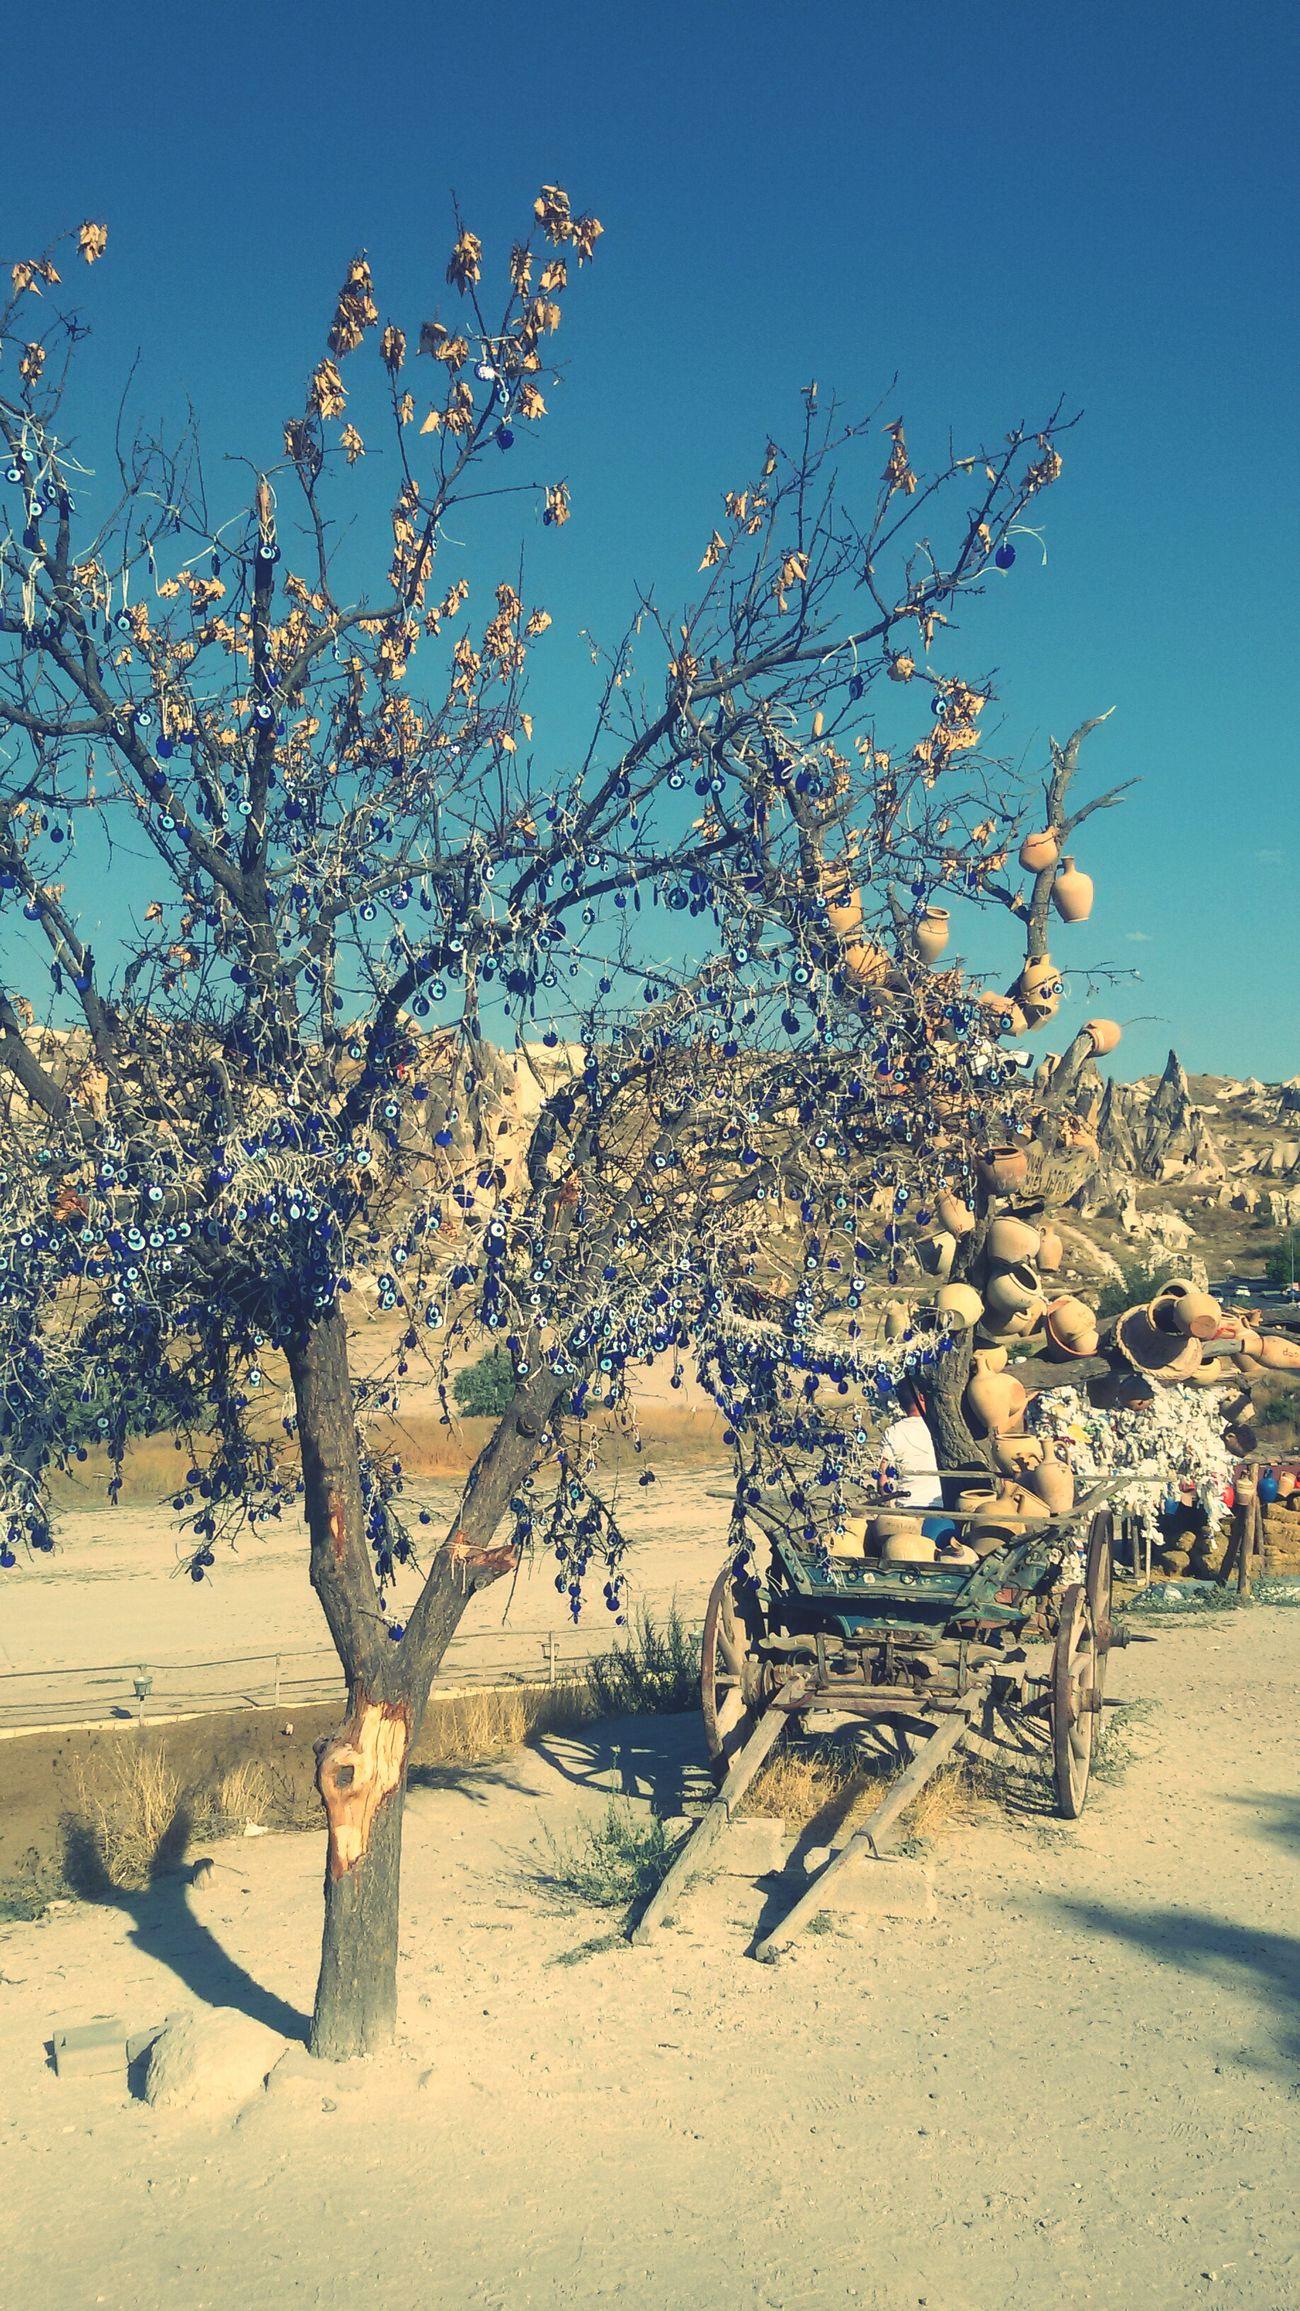 Trees TreePorn Wish Tree Camping First Eyeem Photo Amezing Perfect Wandering